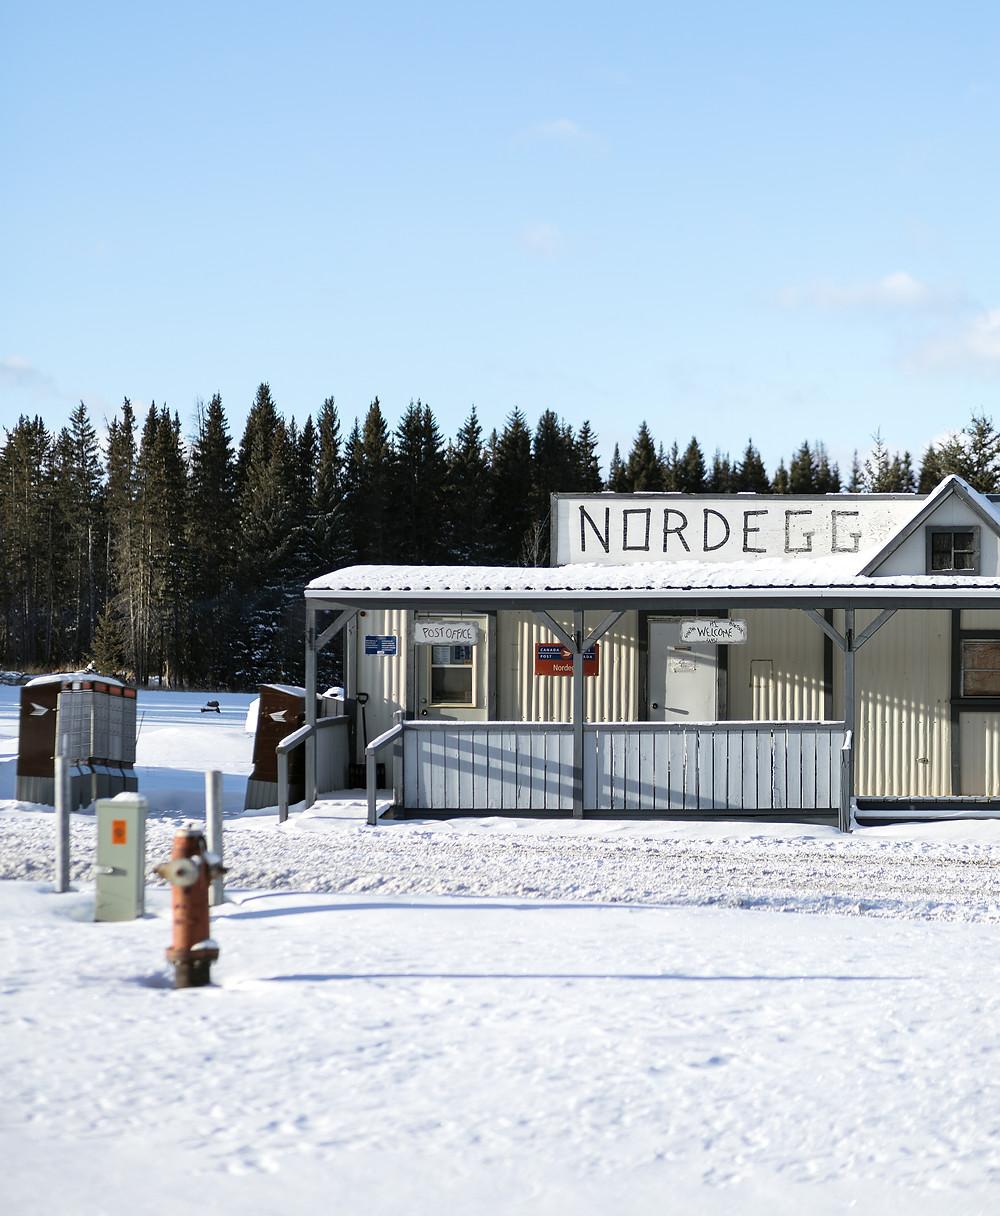 Winter Scenery in Nordegg, Alberta, Canada